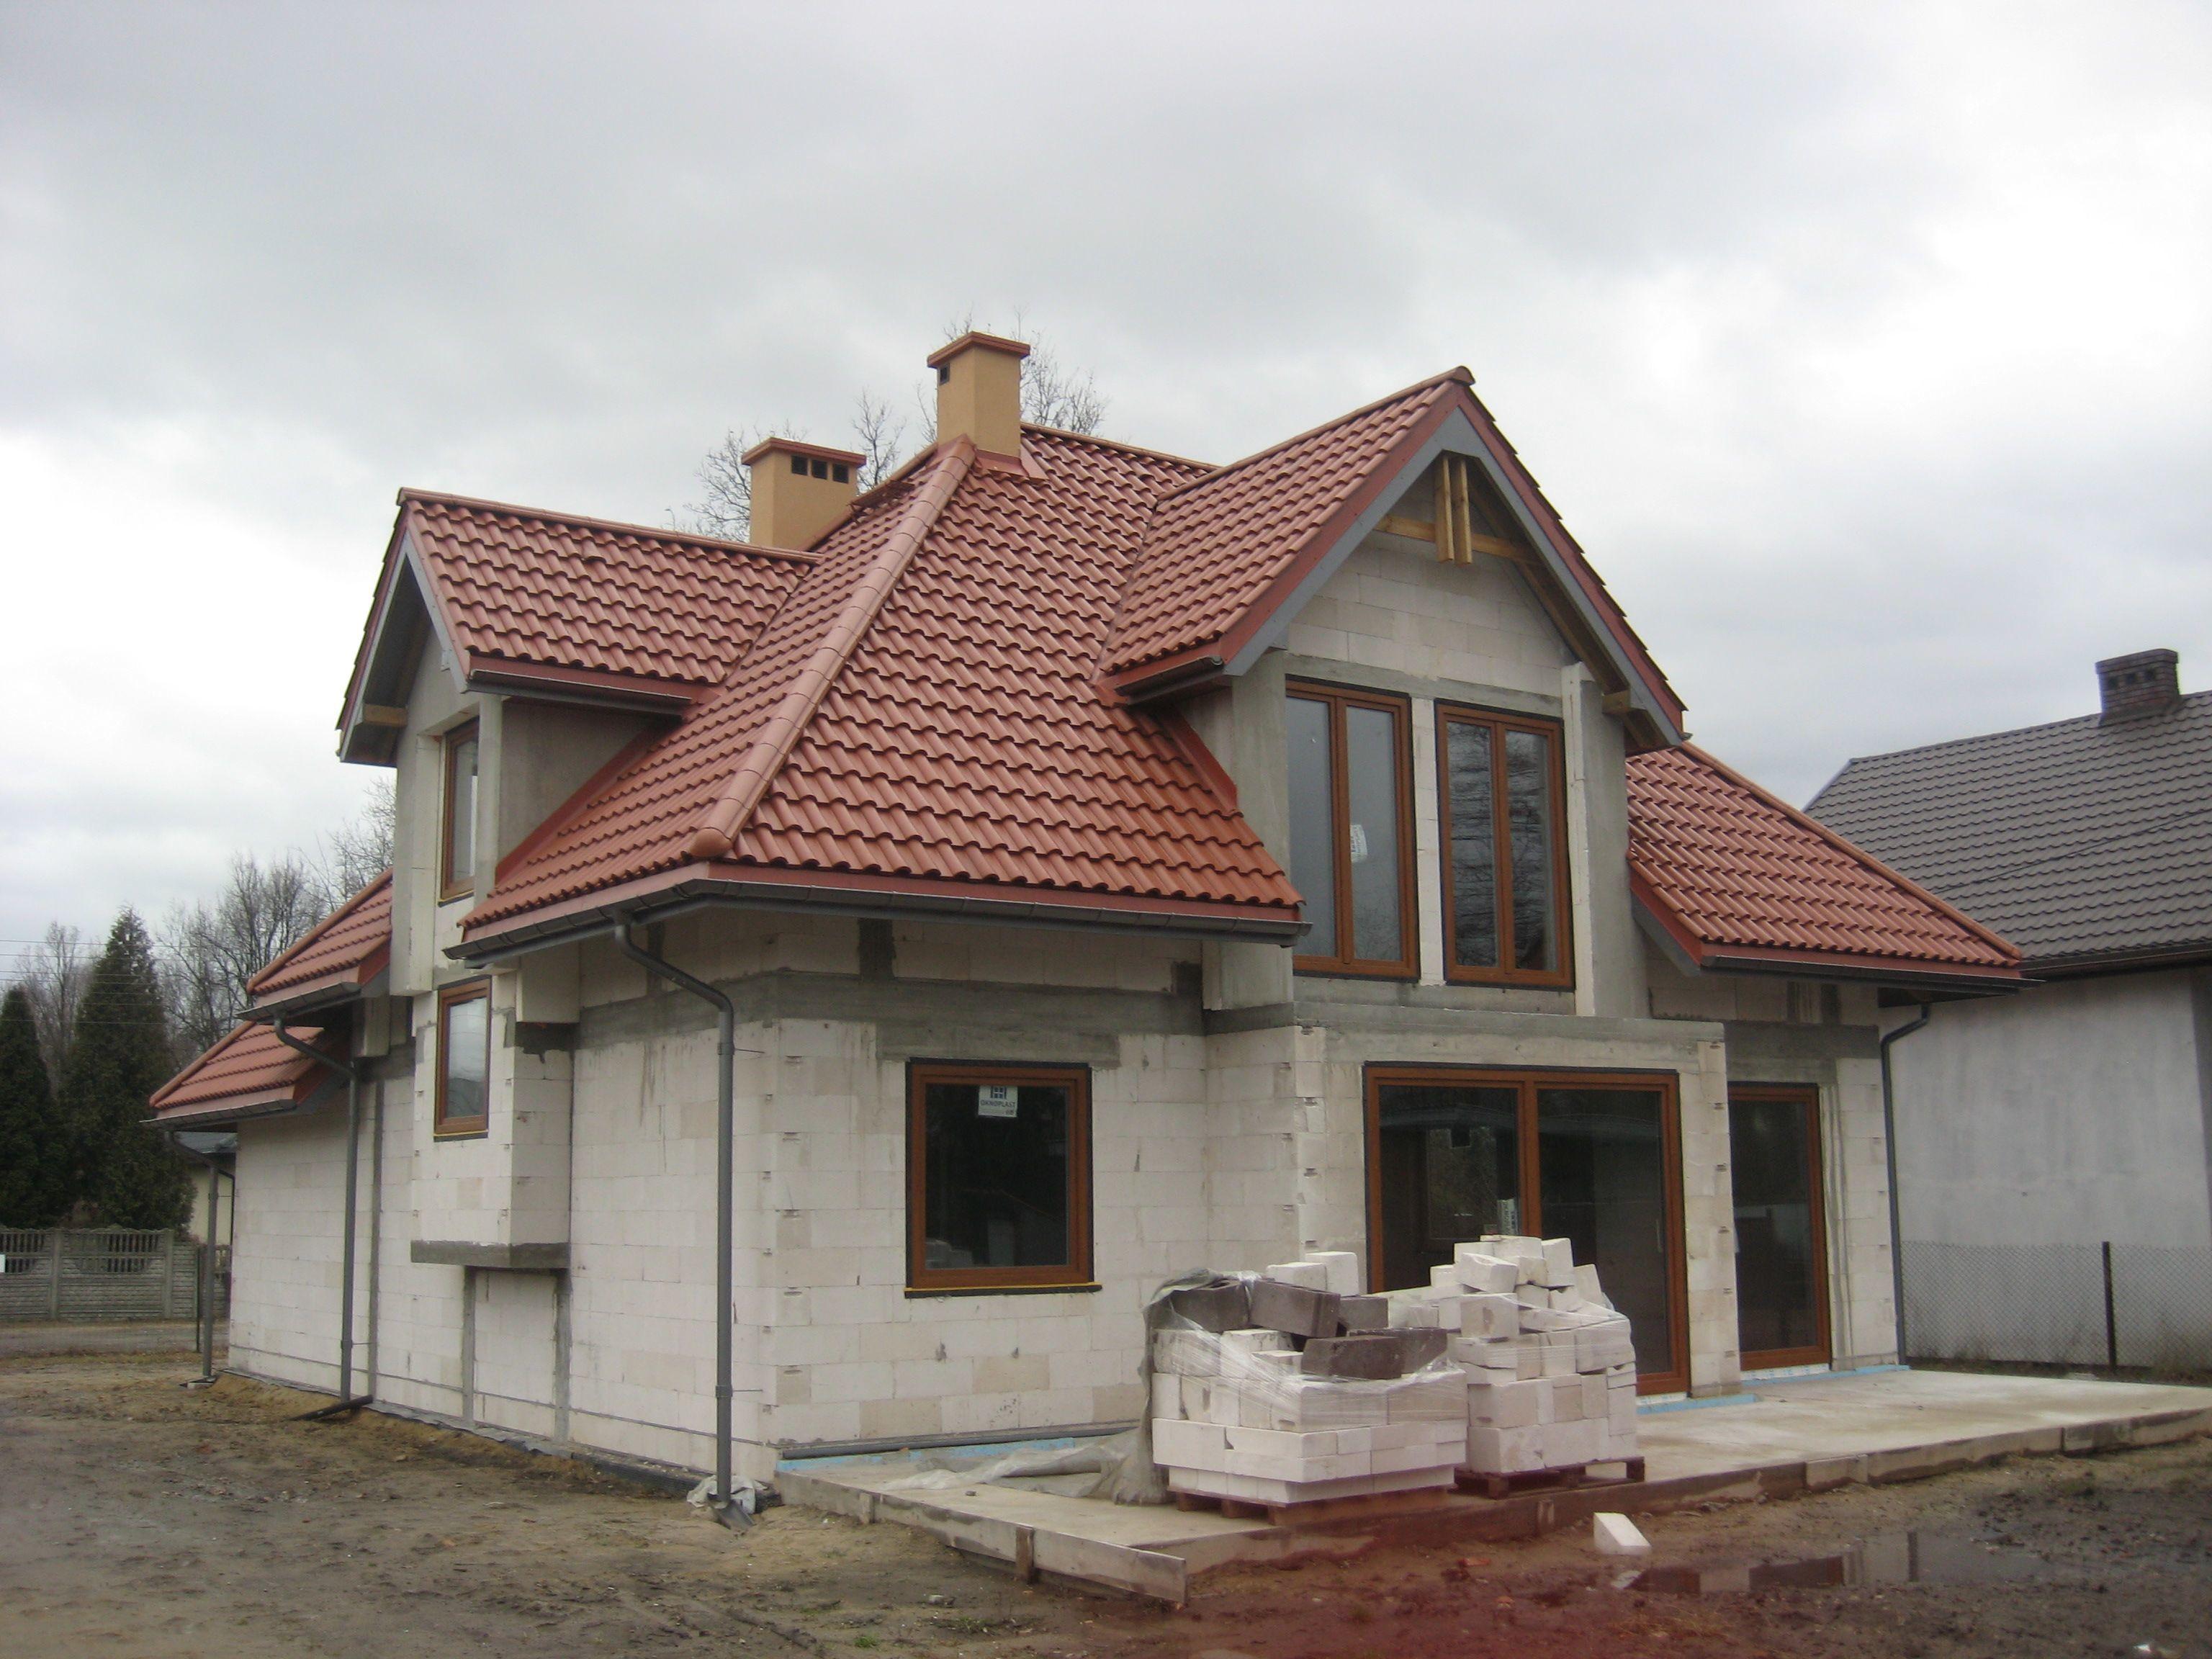 projekt-domu-klasyczny-fot-4-1452174844-9xm8n8ce.jpg